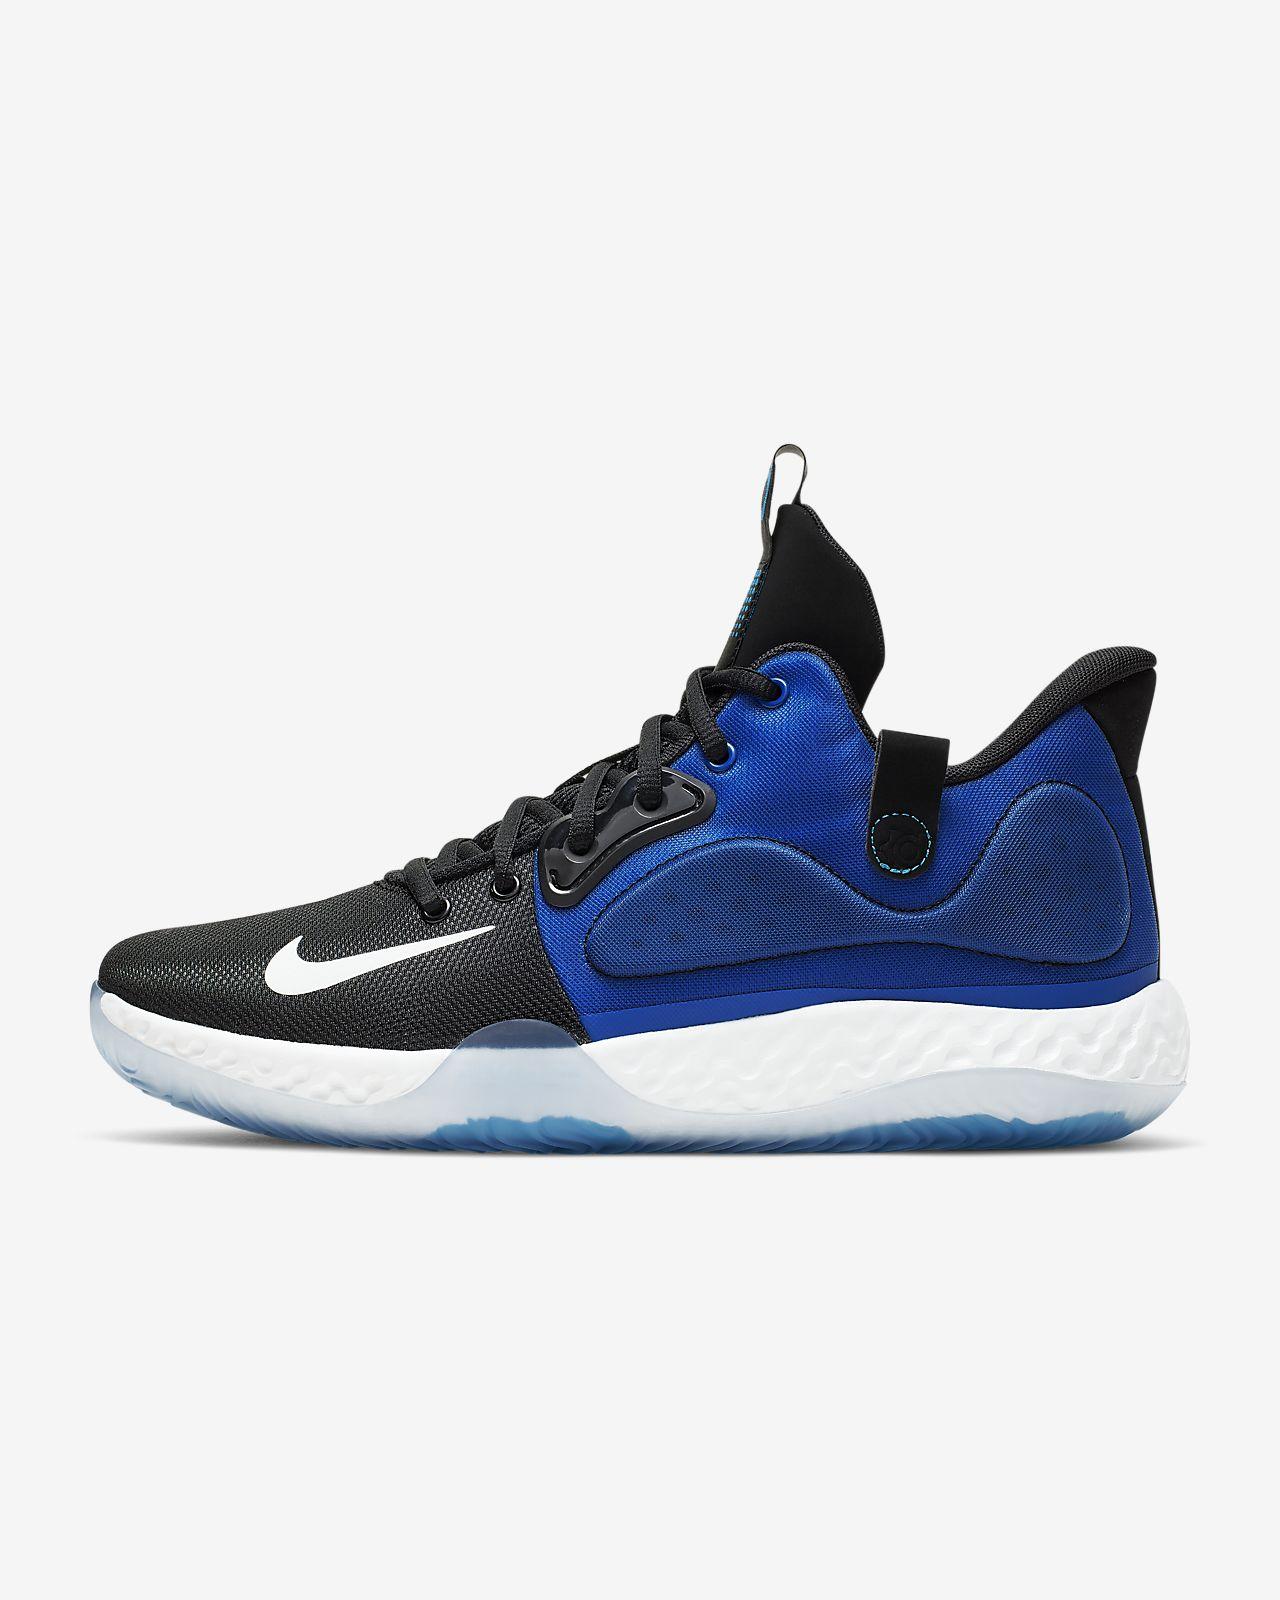 KD Trey 5 VII Shoe